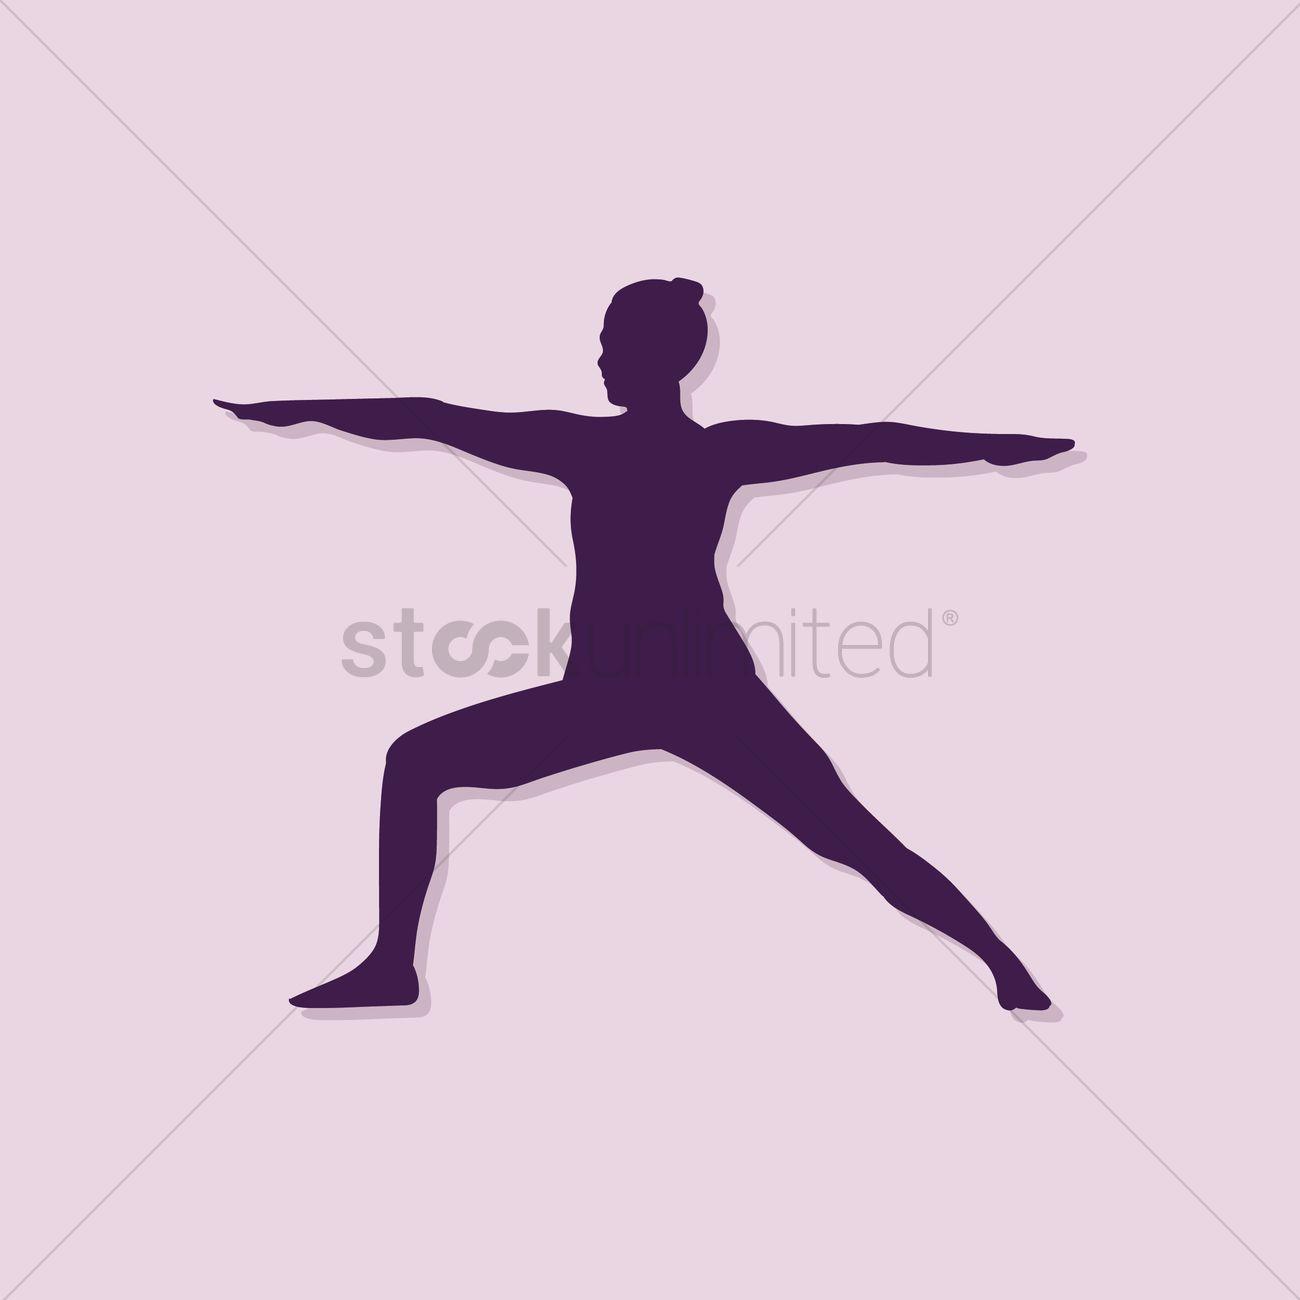 Girl Silhouette Practising Yoga In Warrior Ii Pose Vector Graphic